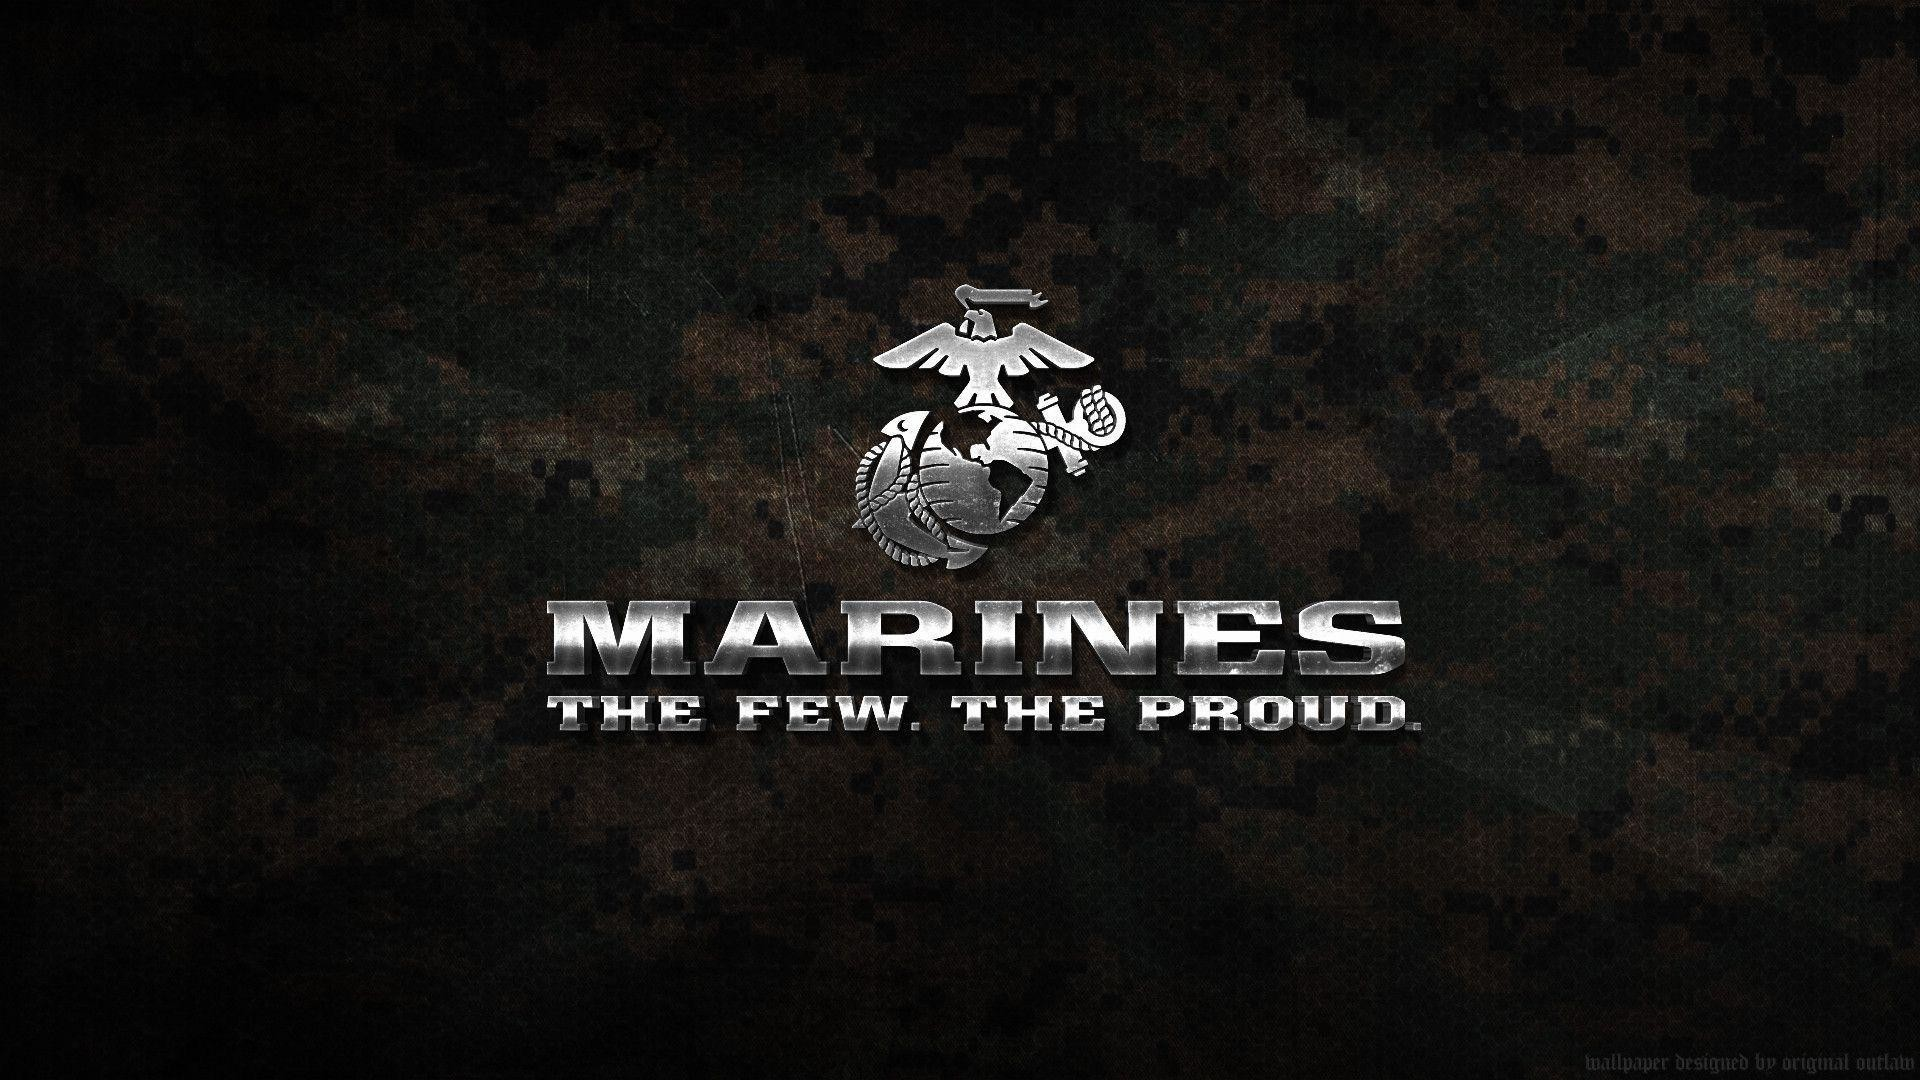 Marine Corps Logo Hd Wallpaper Usmc Desktop Wallpaper Jpg W 1440 H